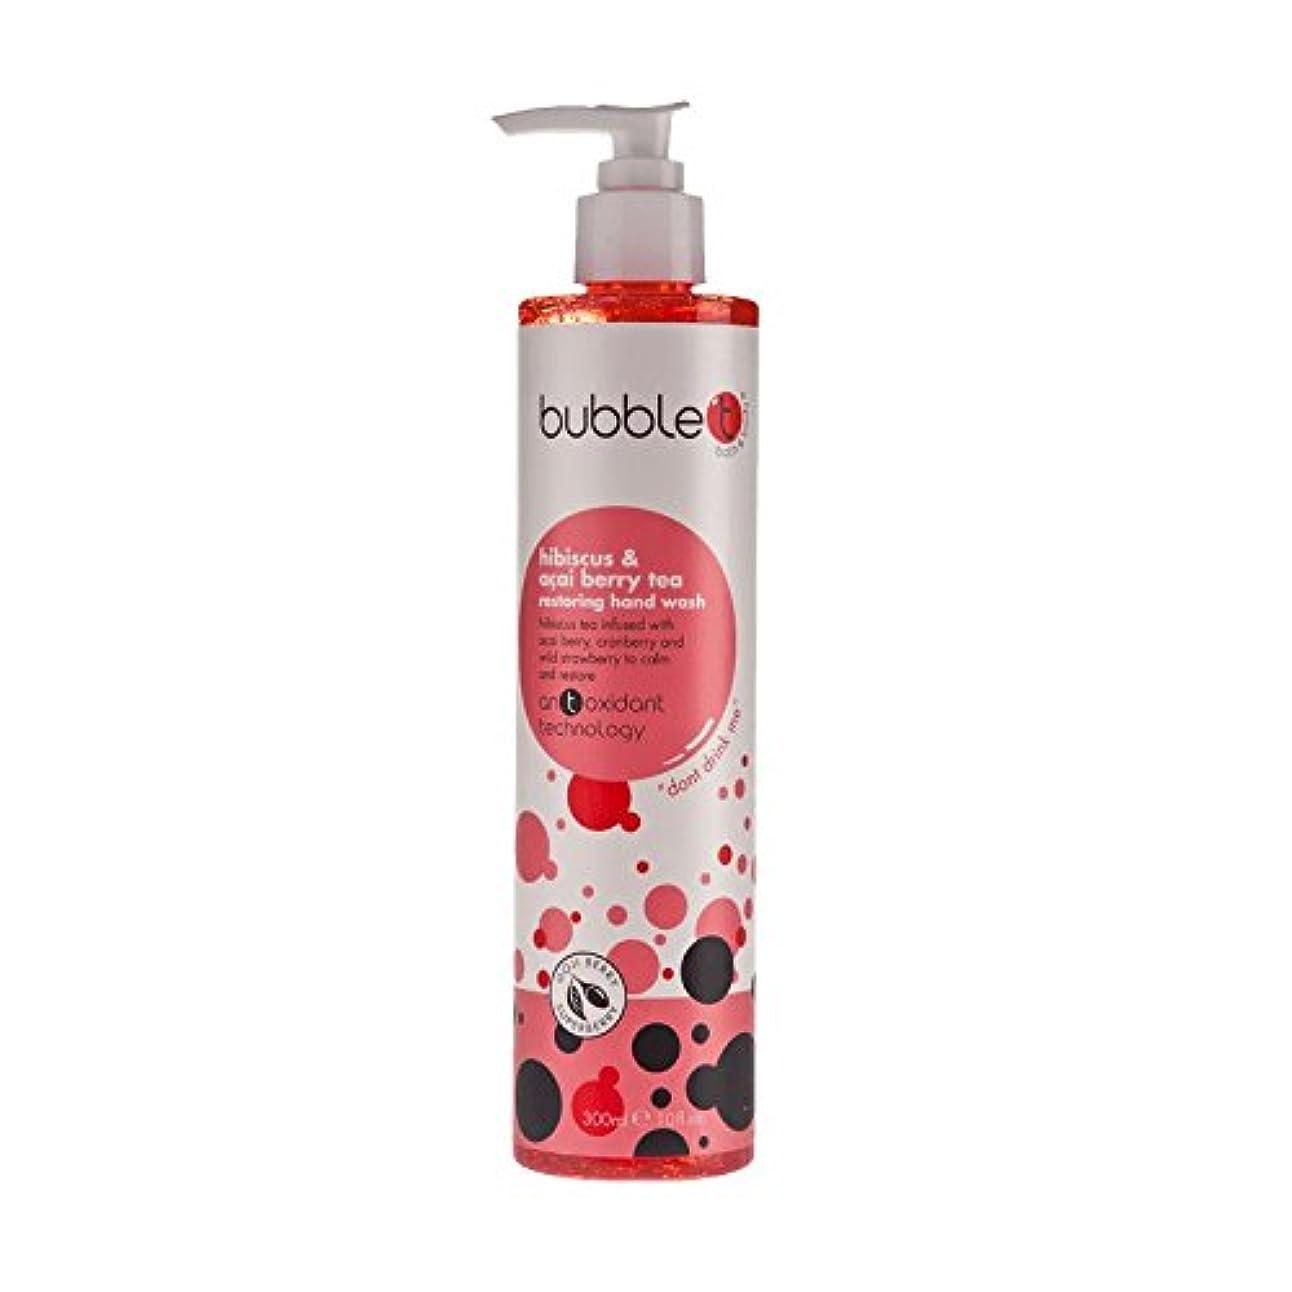 Bubble T Restoring Hand Wash Hisbiscus & Acai Berry Tea 300ml (Pack of 2) - バブルトン手洗いHisbiscus&アサイベリー茶300ミリリットル...